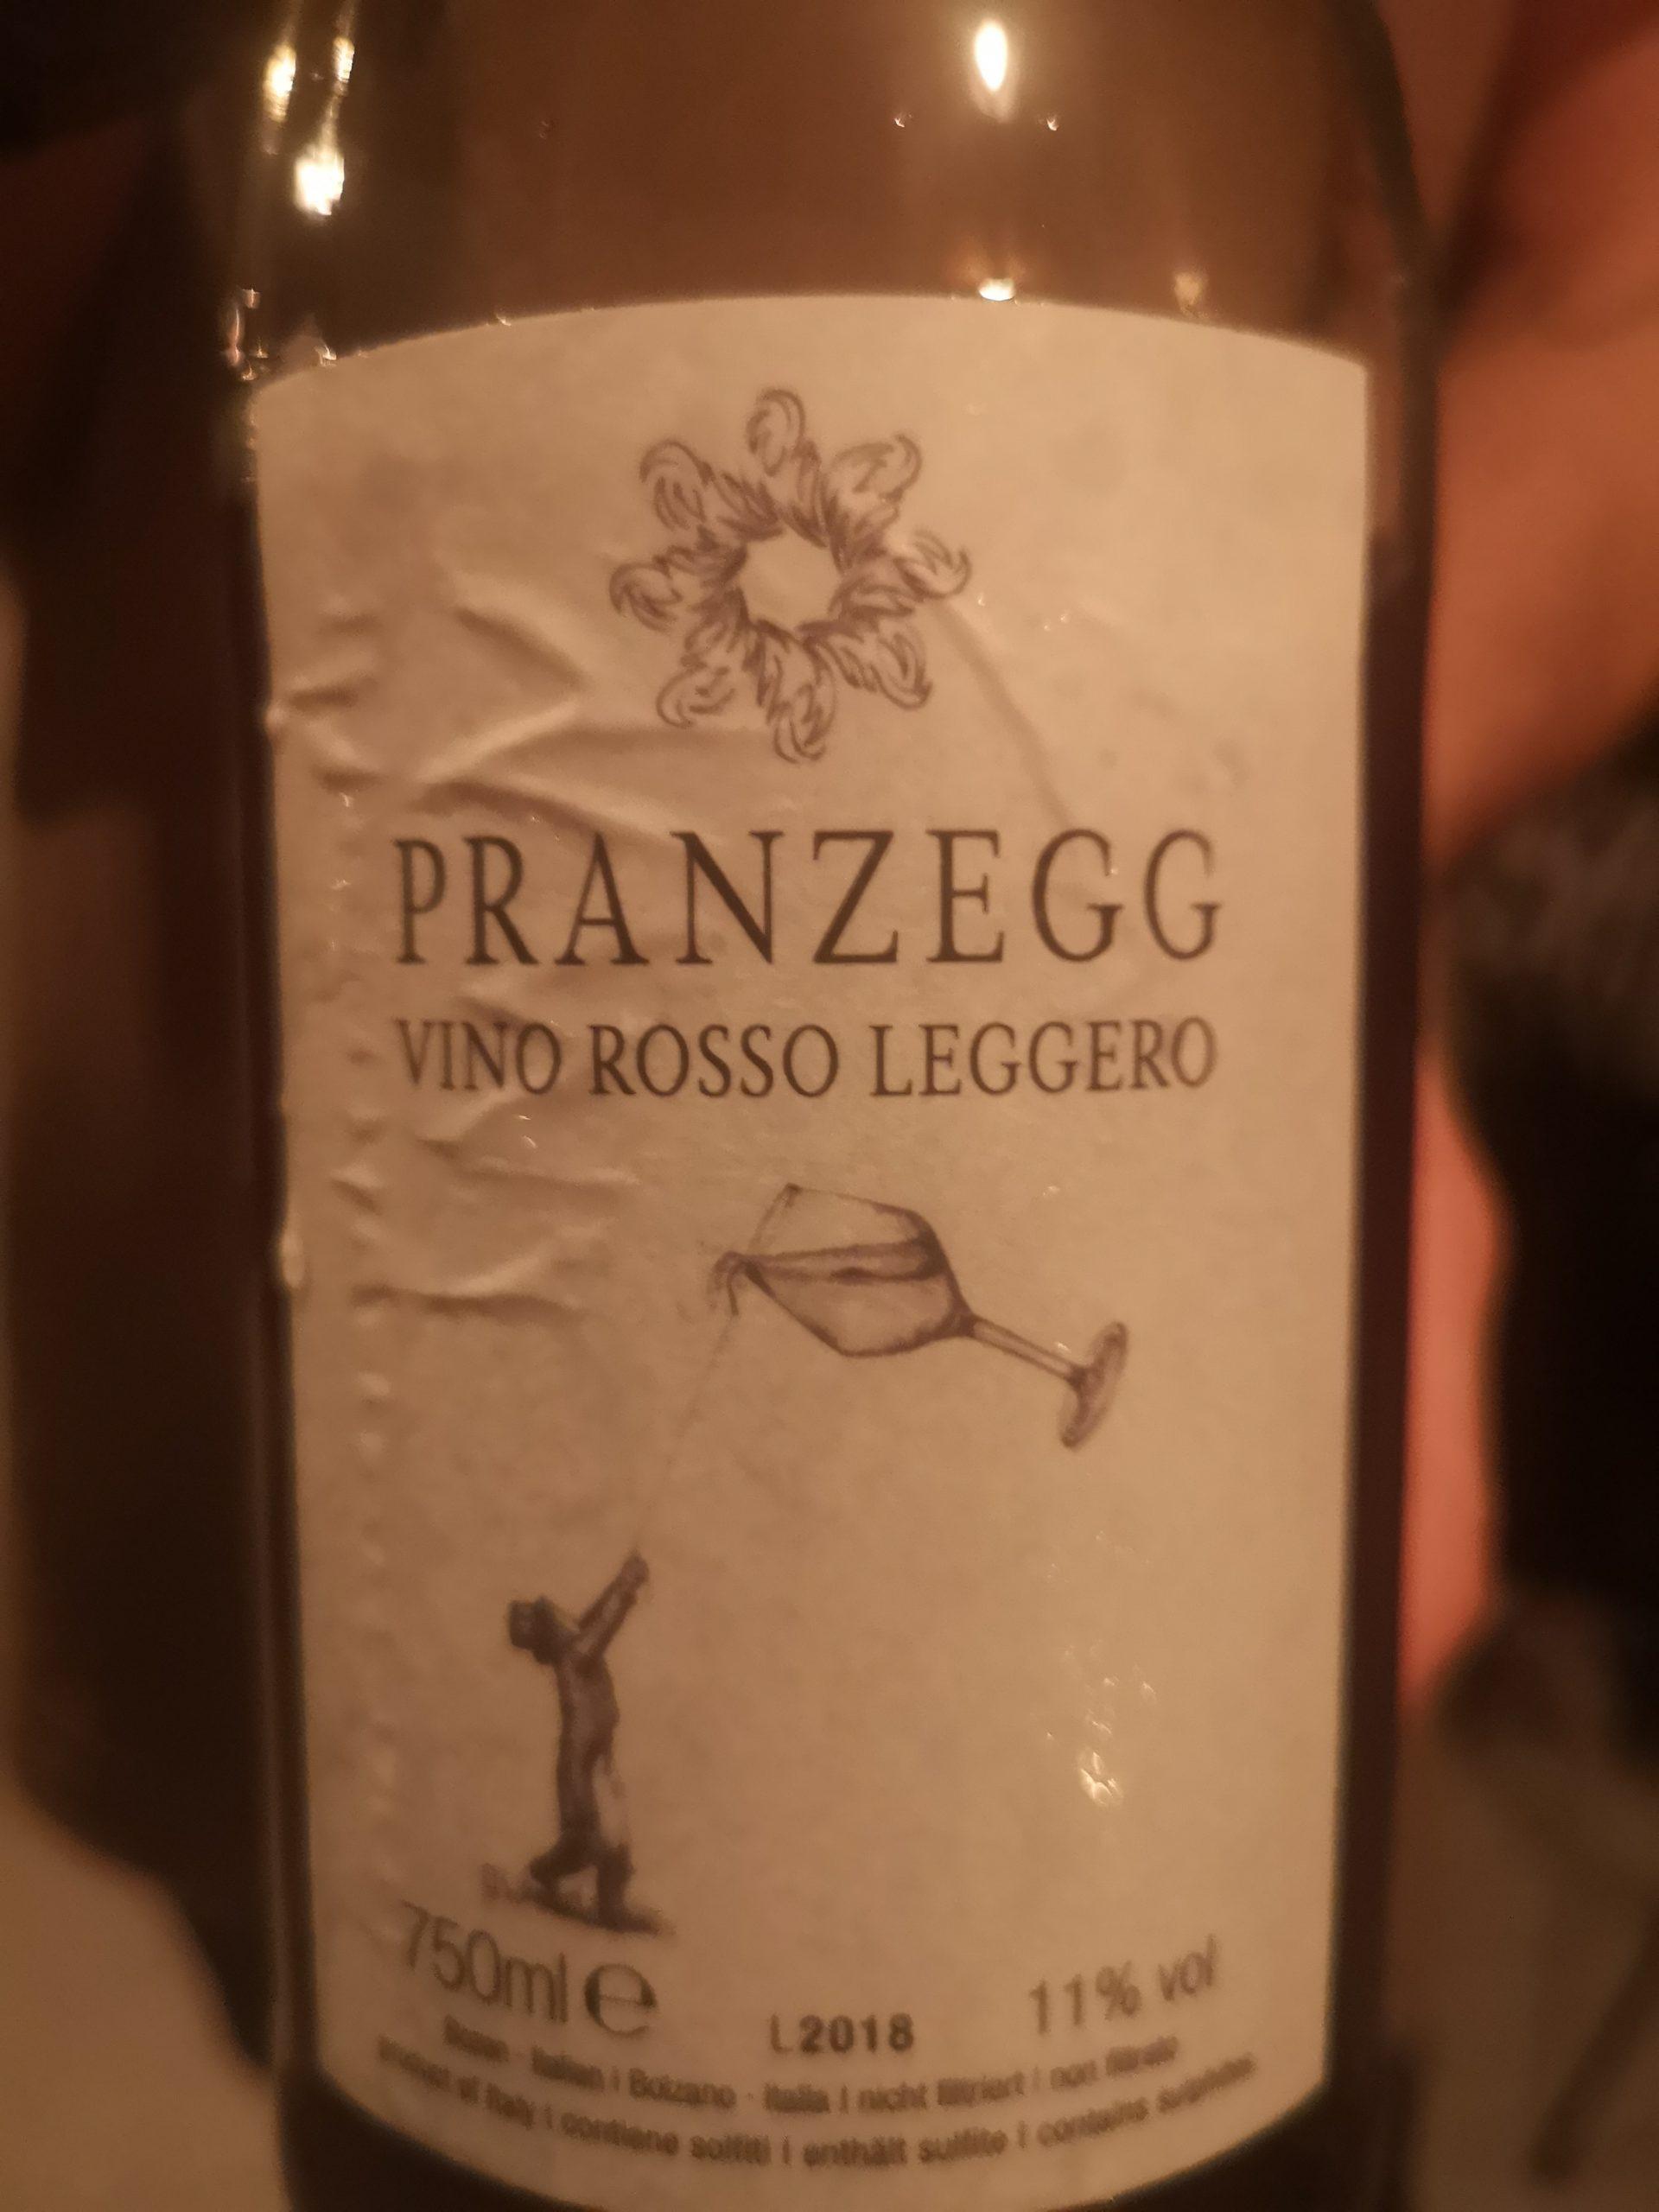 2018 Vino Rosso Leggero   Pranzegg